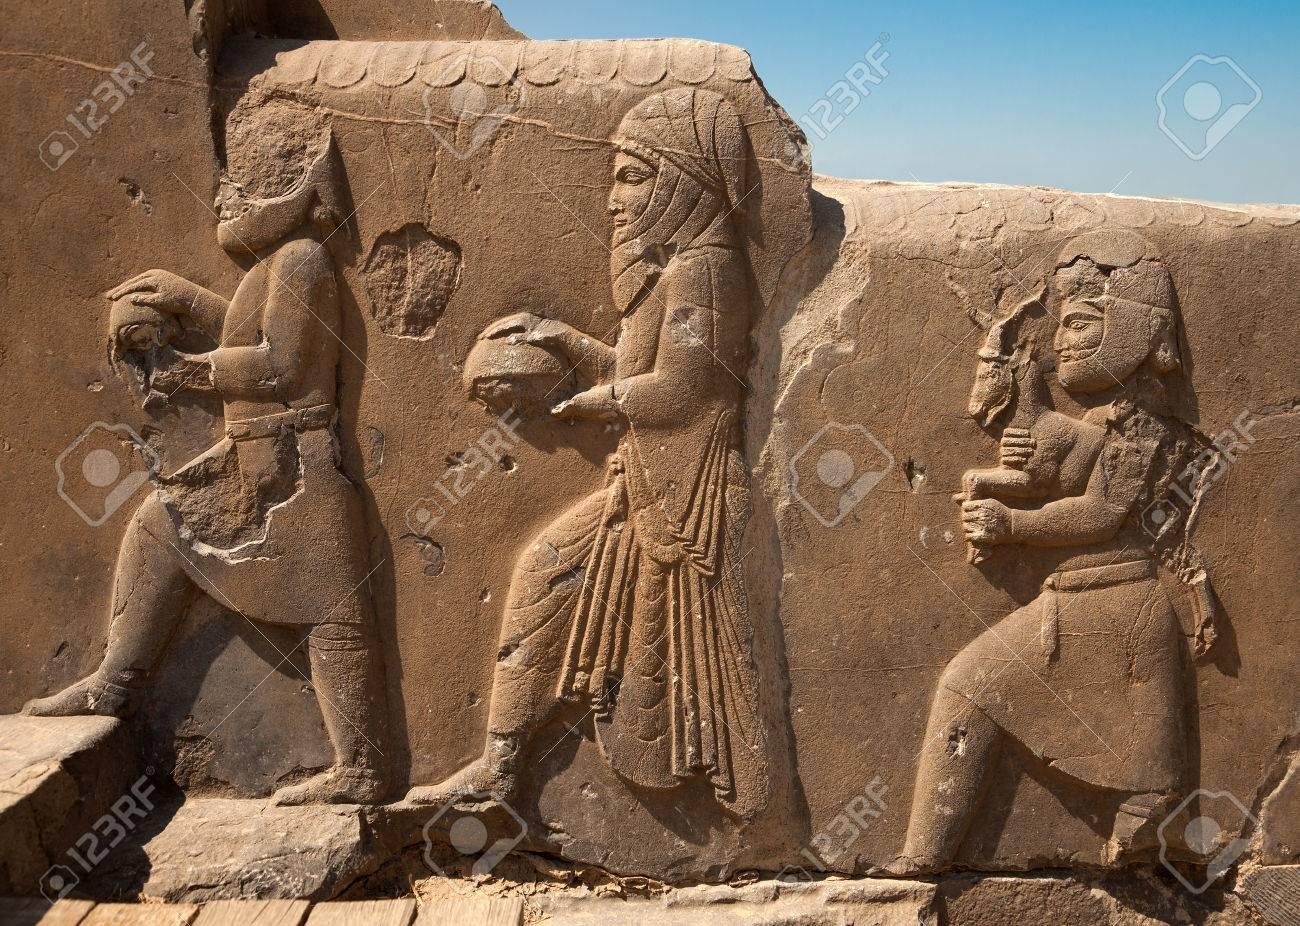 Bas relief carvings of dignitaries and representatives bringing